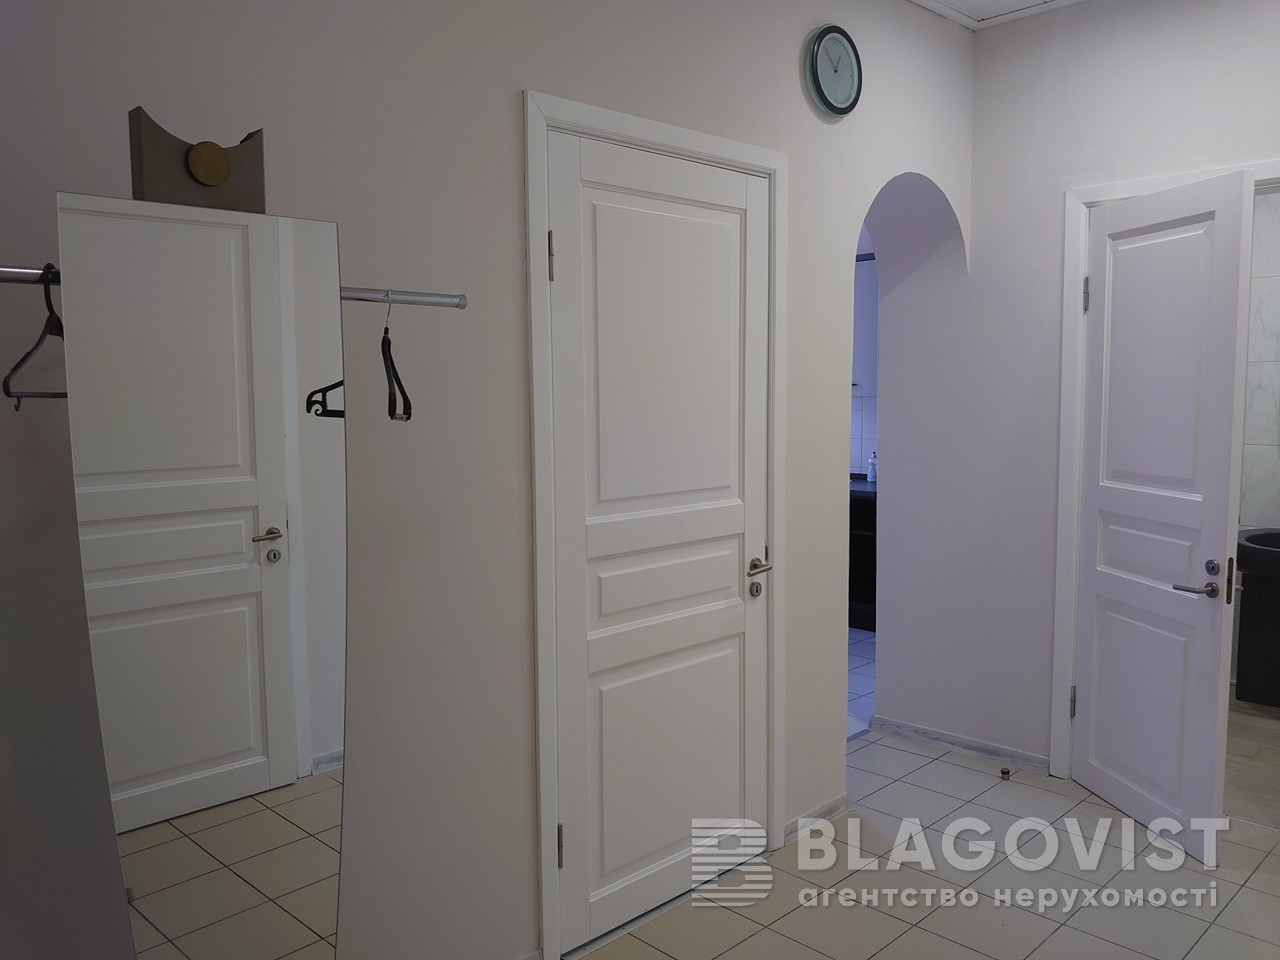 Квартира R-39925, Крещатик, 21, Киев - Фото 19